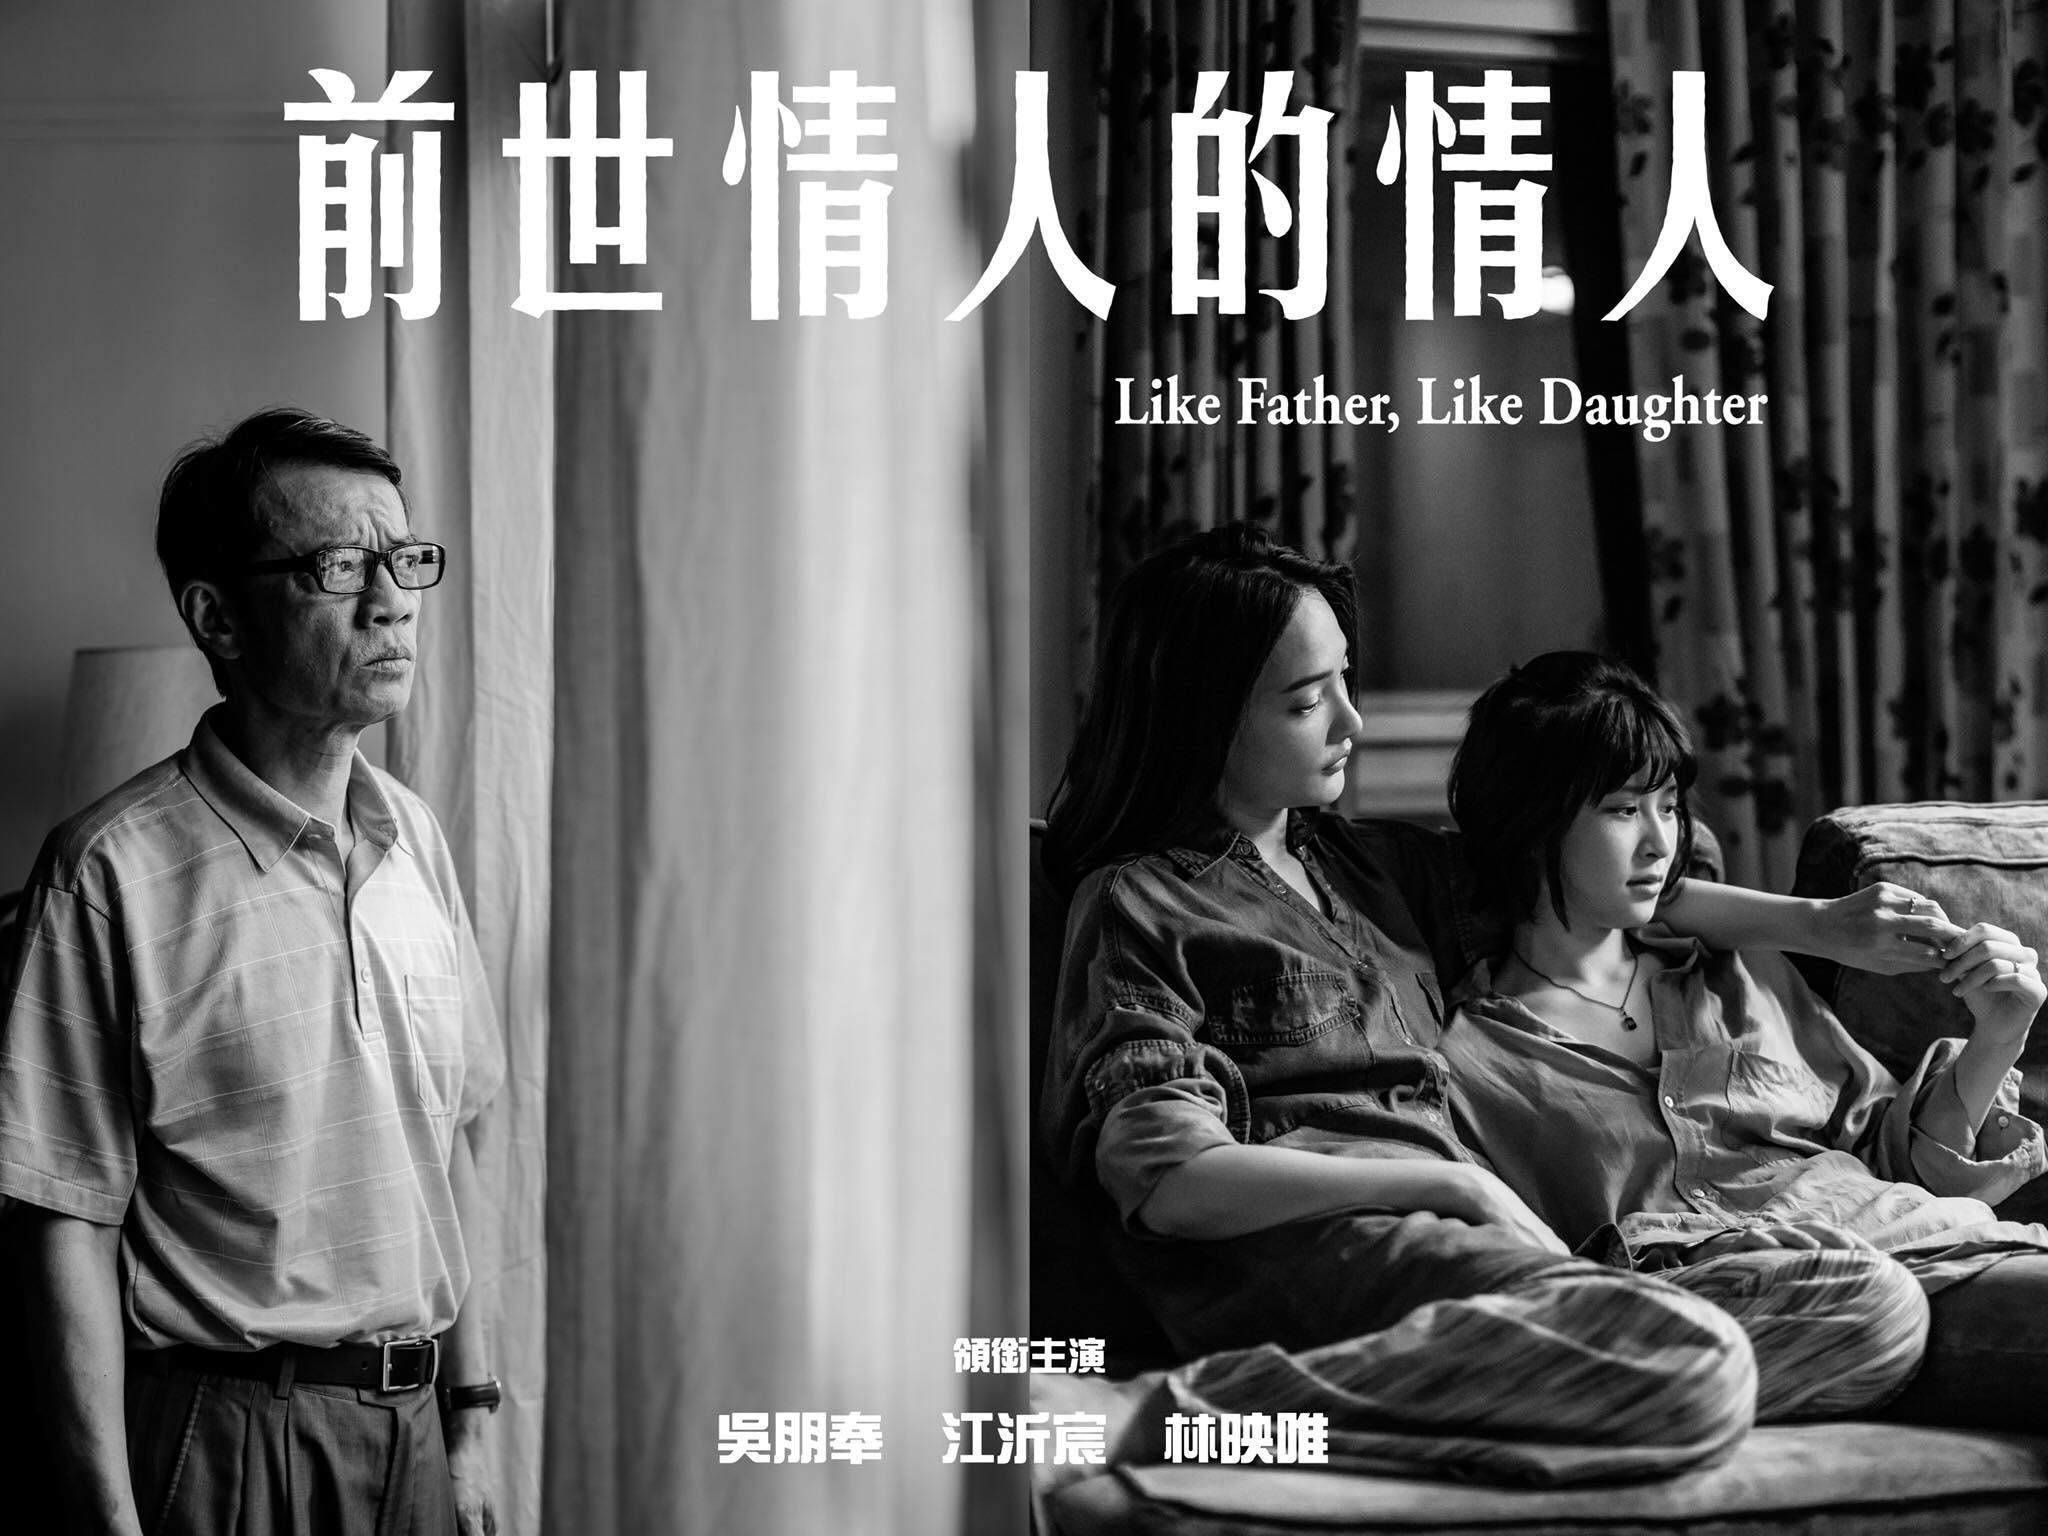 Like Father, Like Daughter (2019)